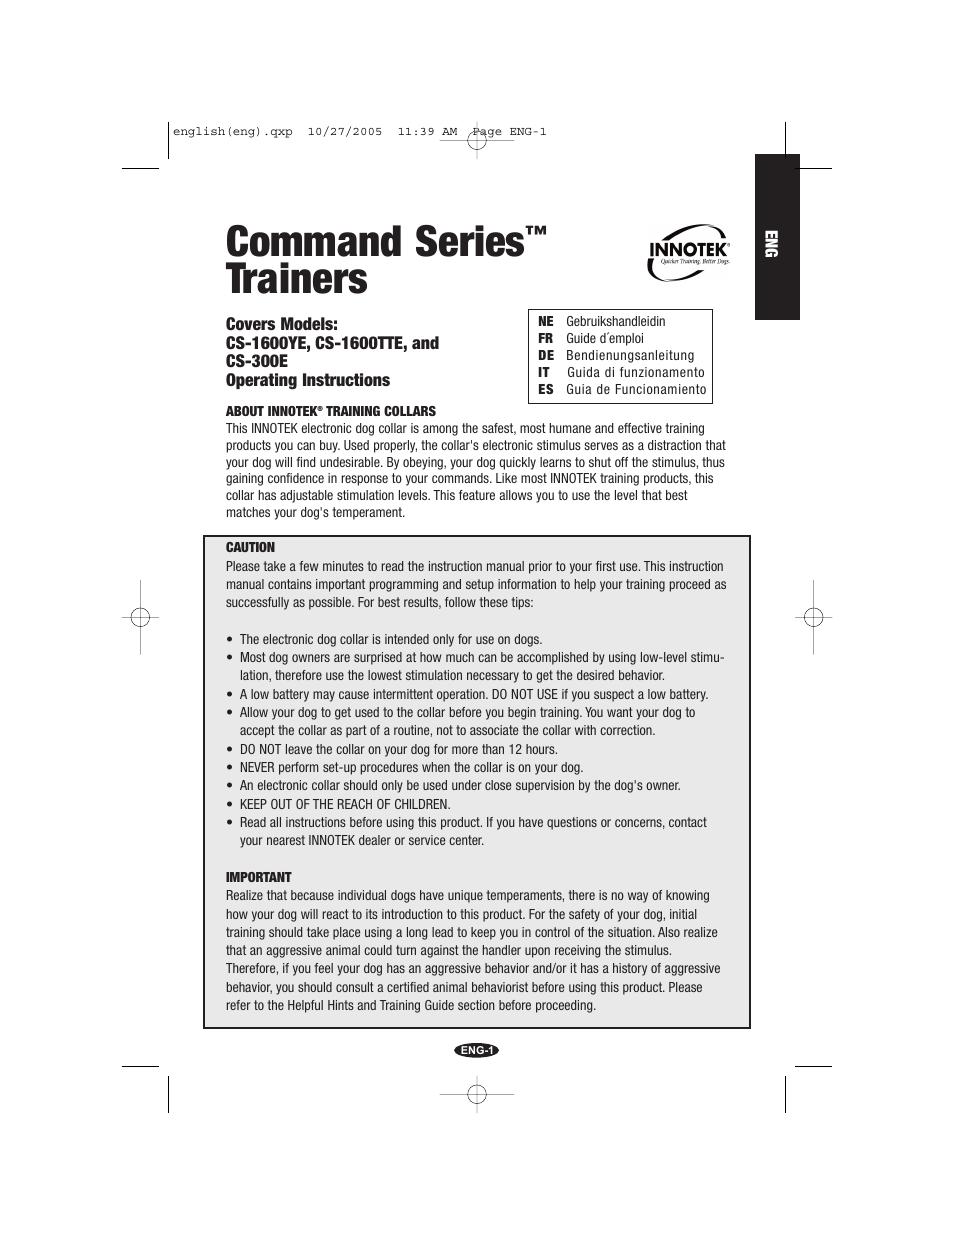 Petsafe Innotek Command Series Remote Trainer User Manual